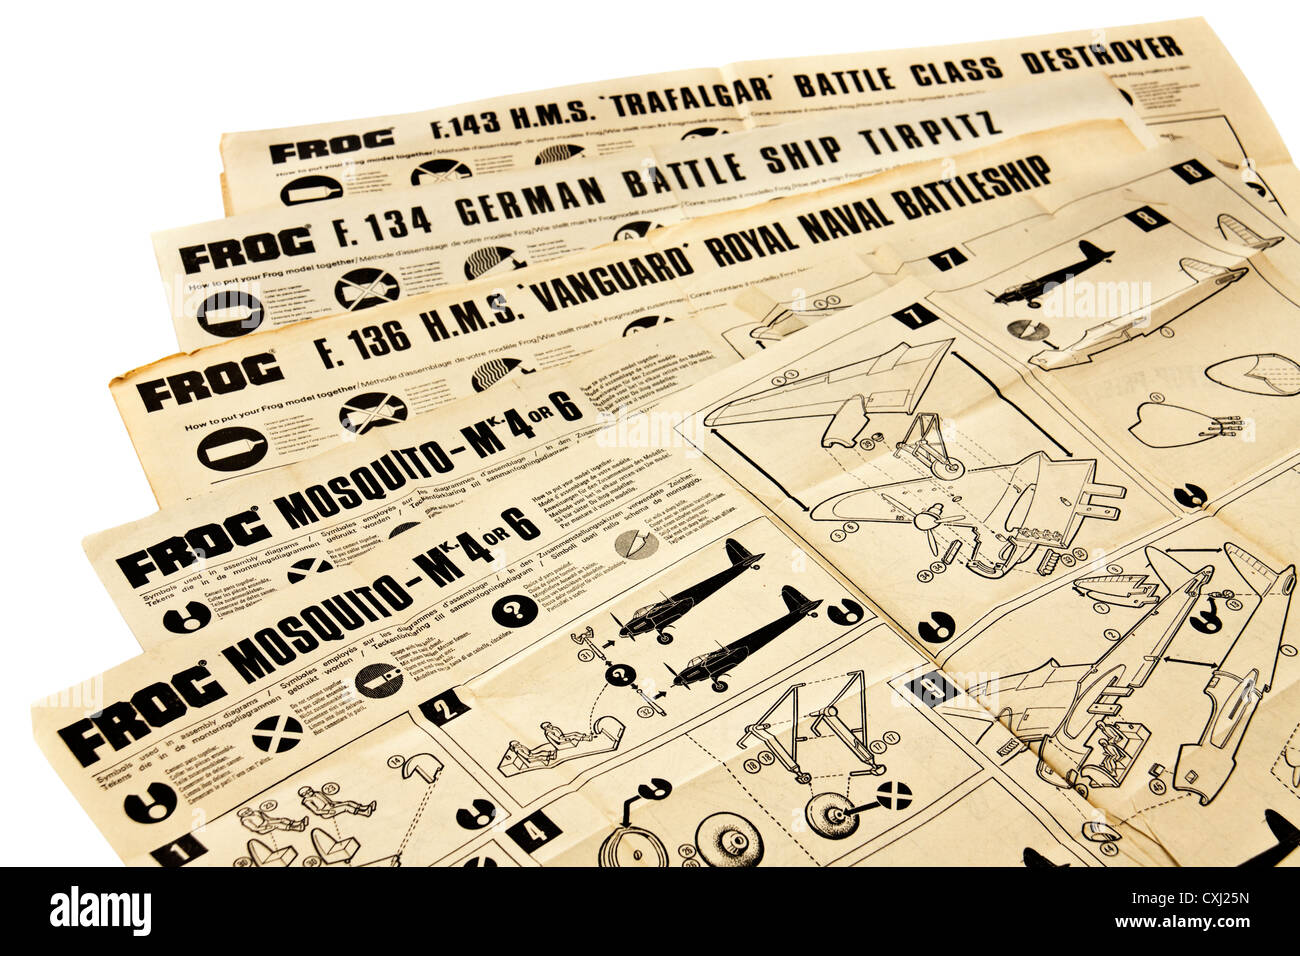 Frog Model Stockfotos & Frog Model Bilder - Alamy